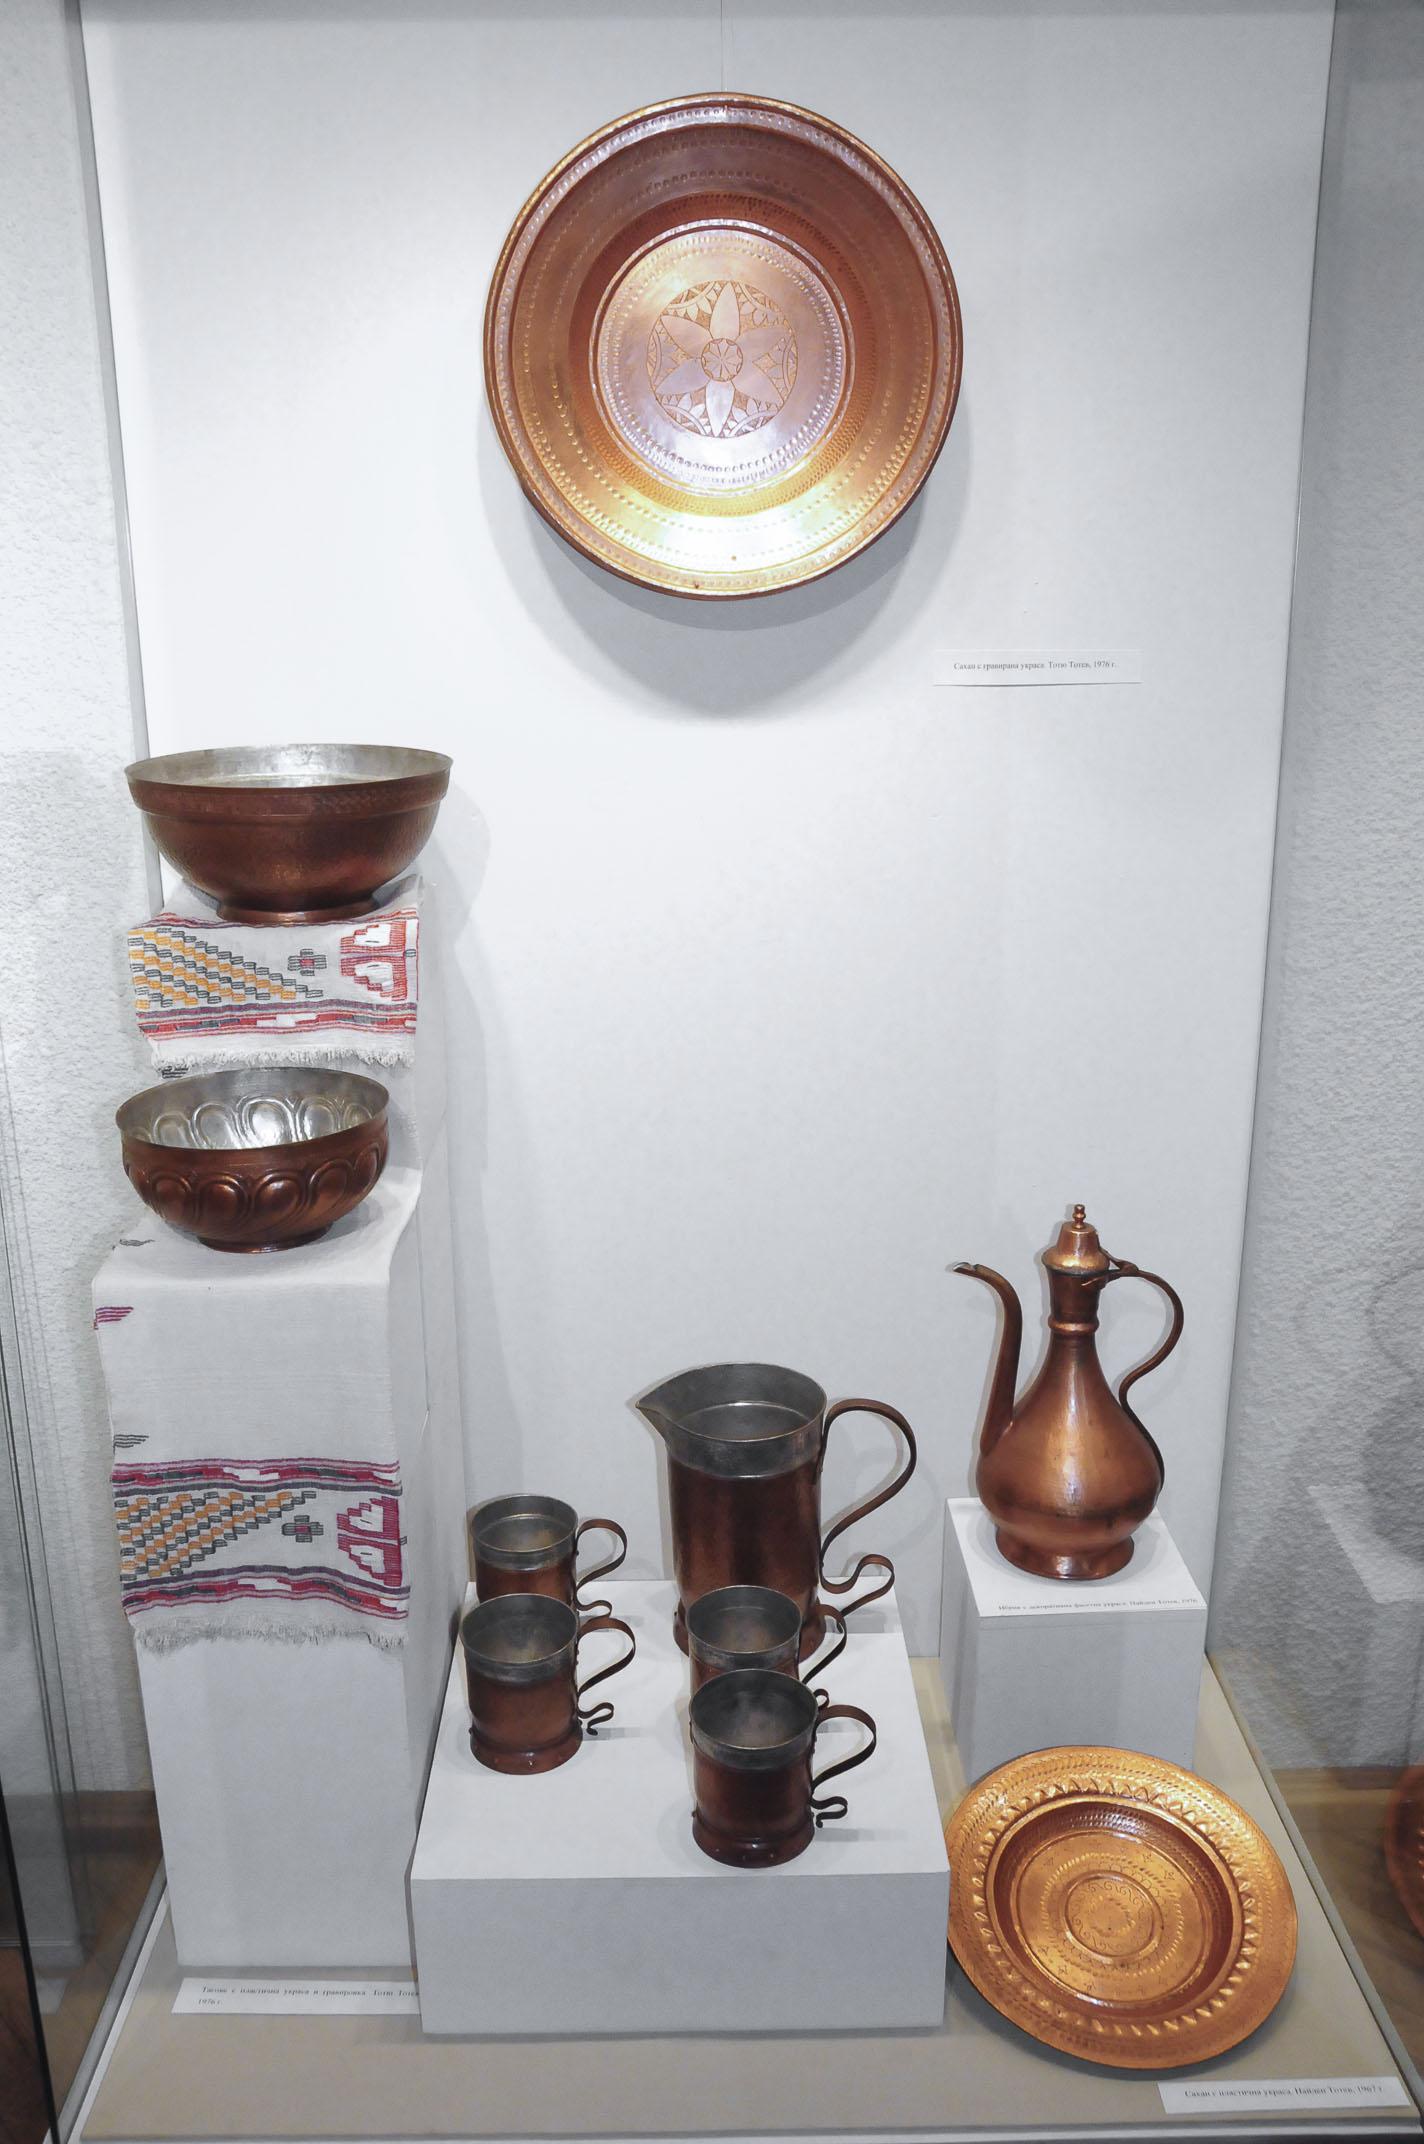 troyan-museum-mednikarstvo-ot-troyanskiq-krai-16